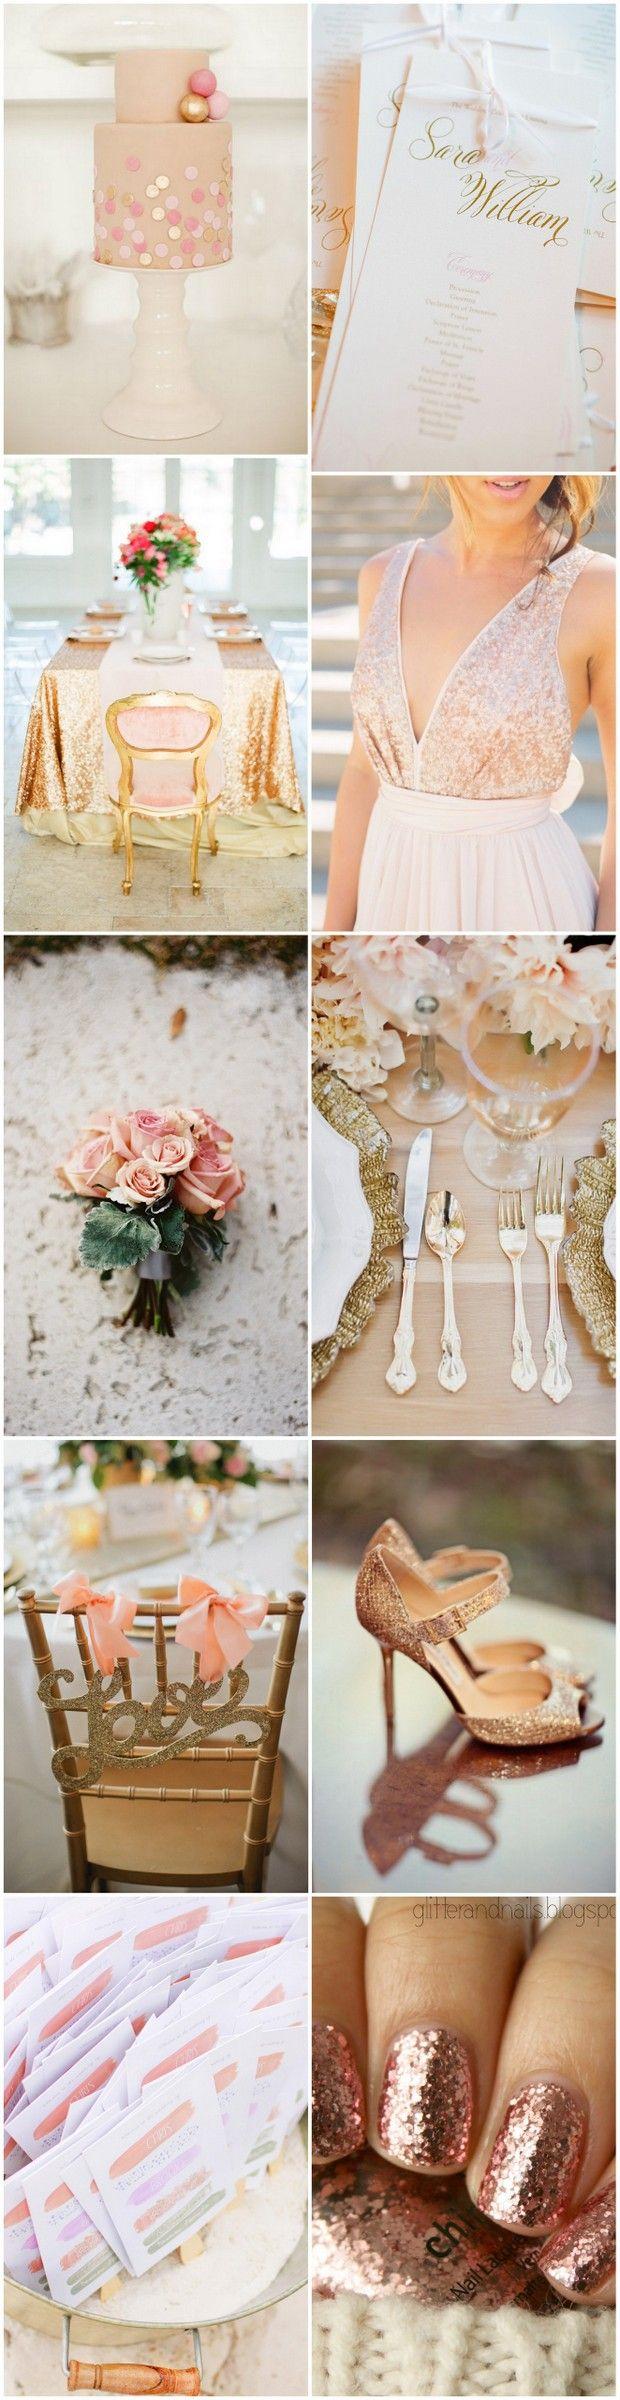 Romantic Rose Gold Wedding Inspiration | weddingsonline